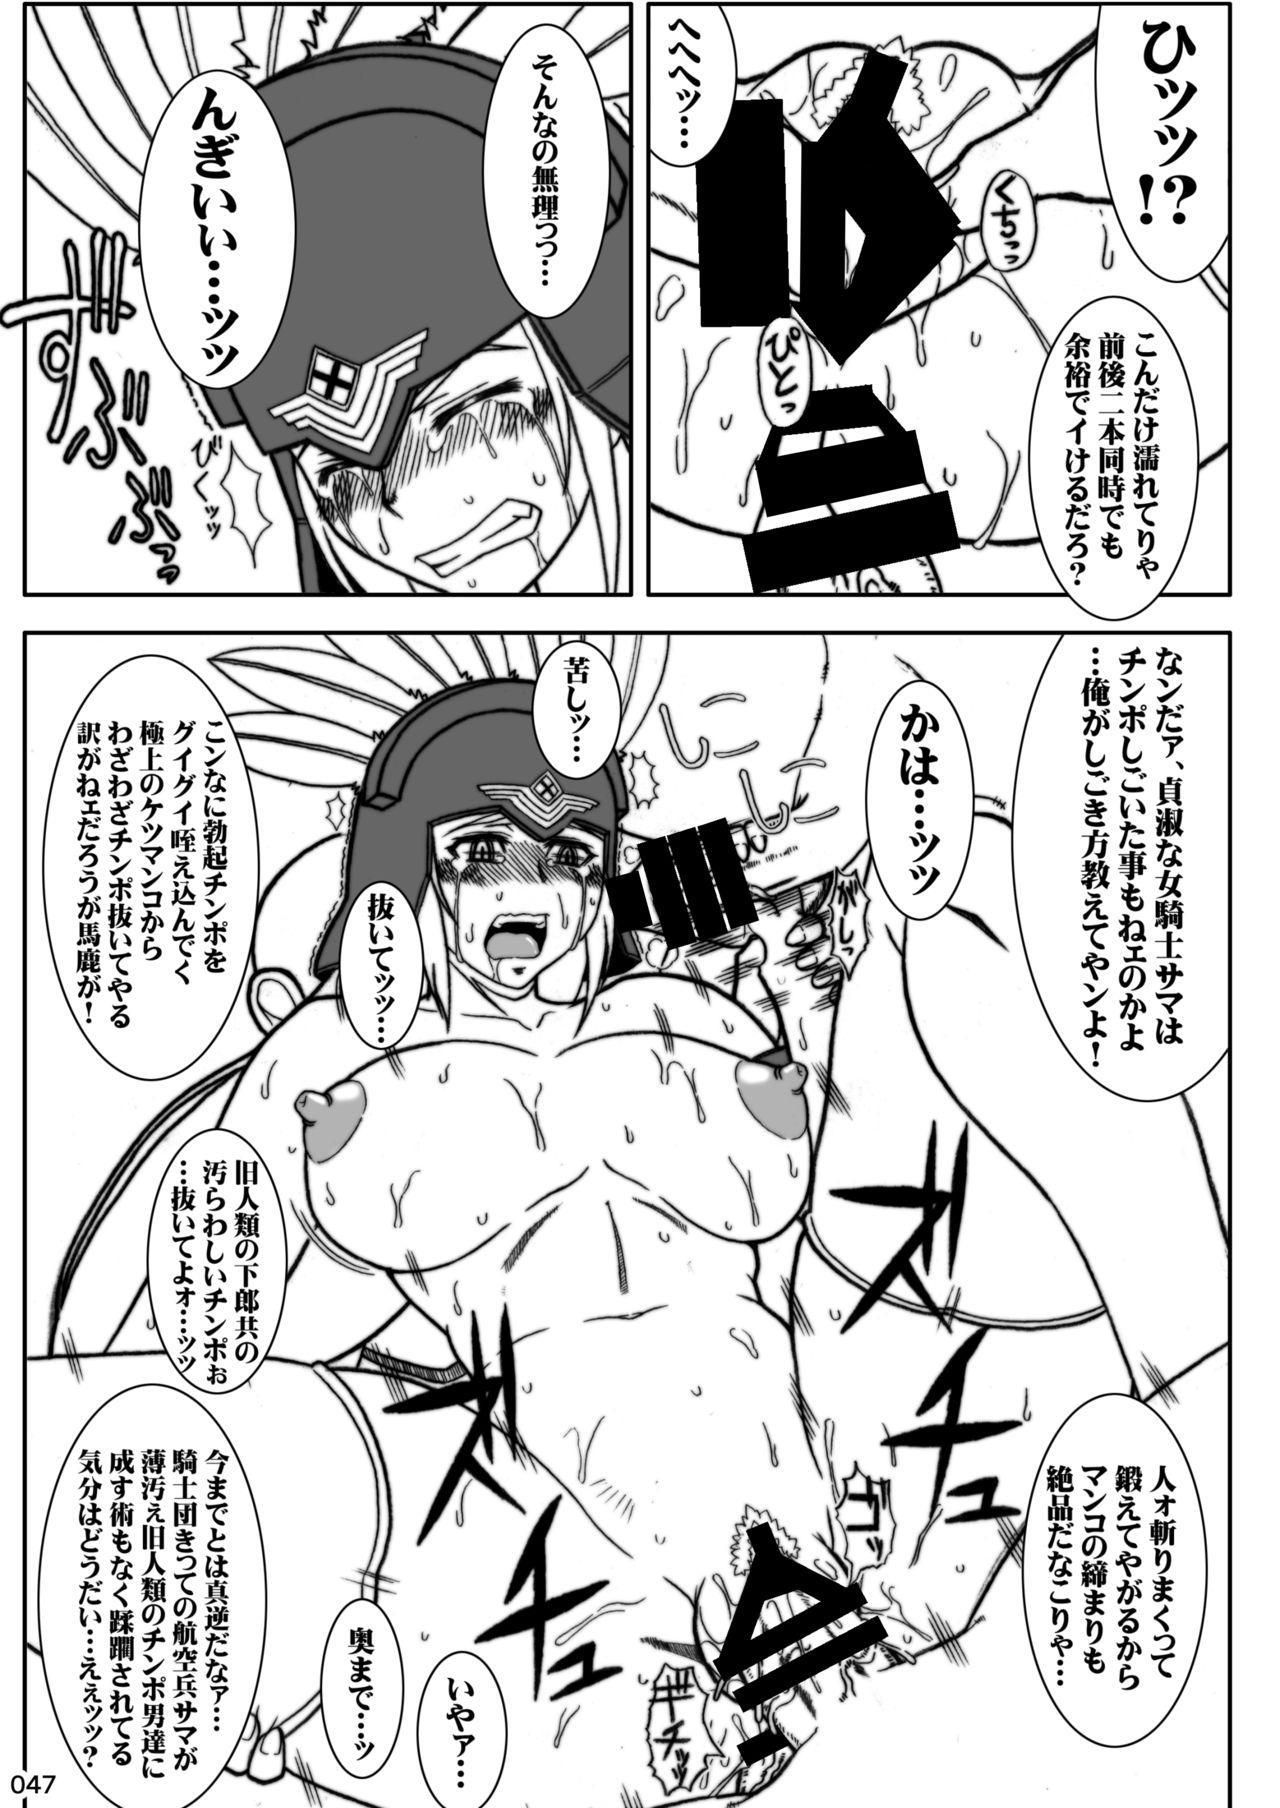 Akatsuki Blitzkampf & EN-1 Perfekt Welt Gangbang Anthology 46